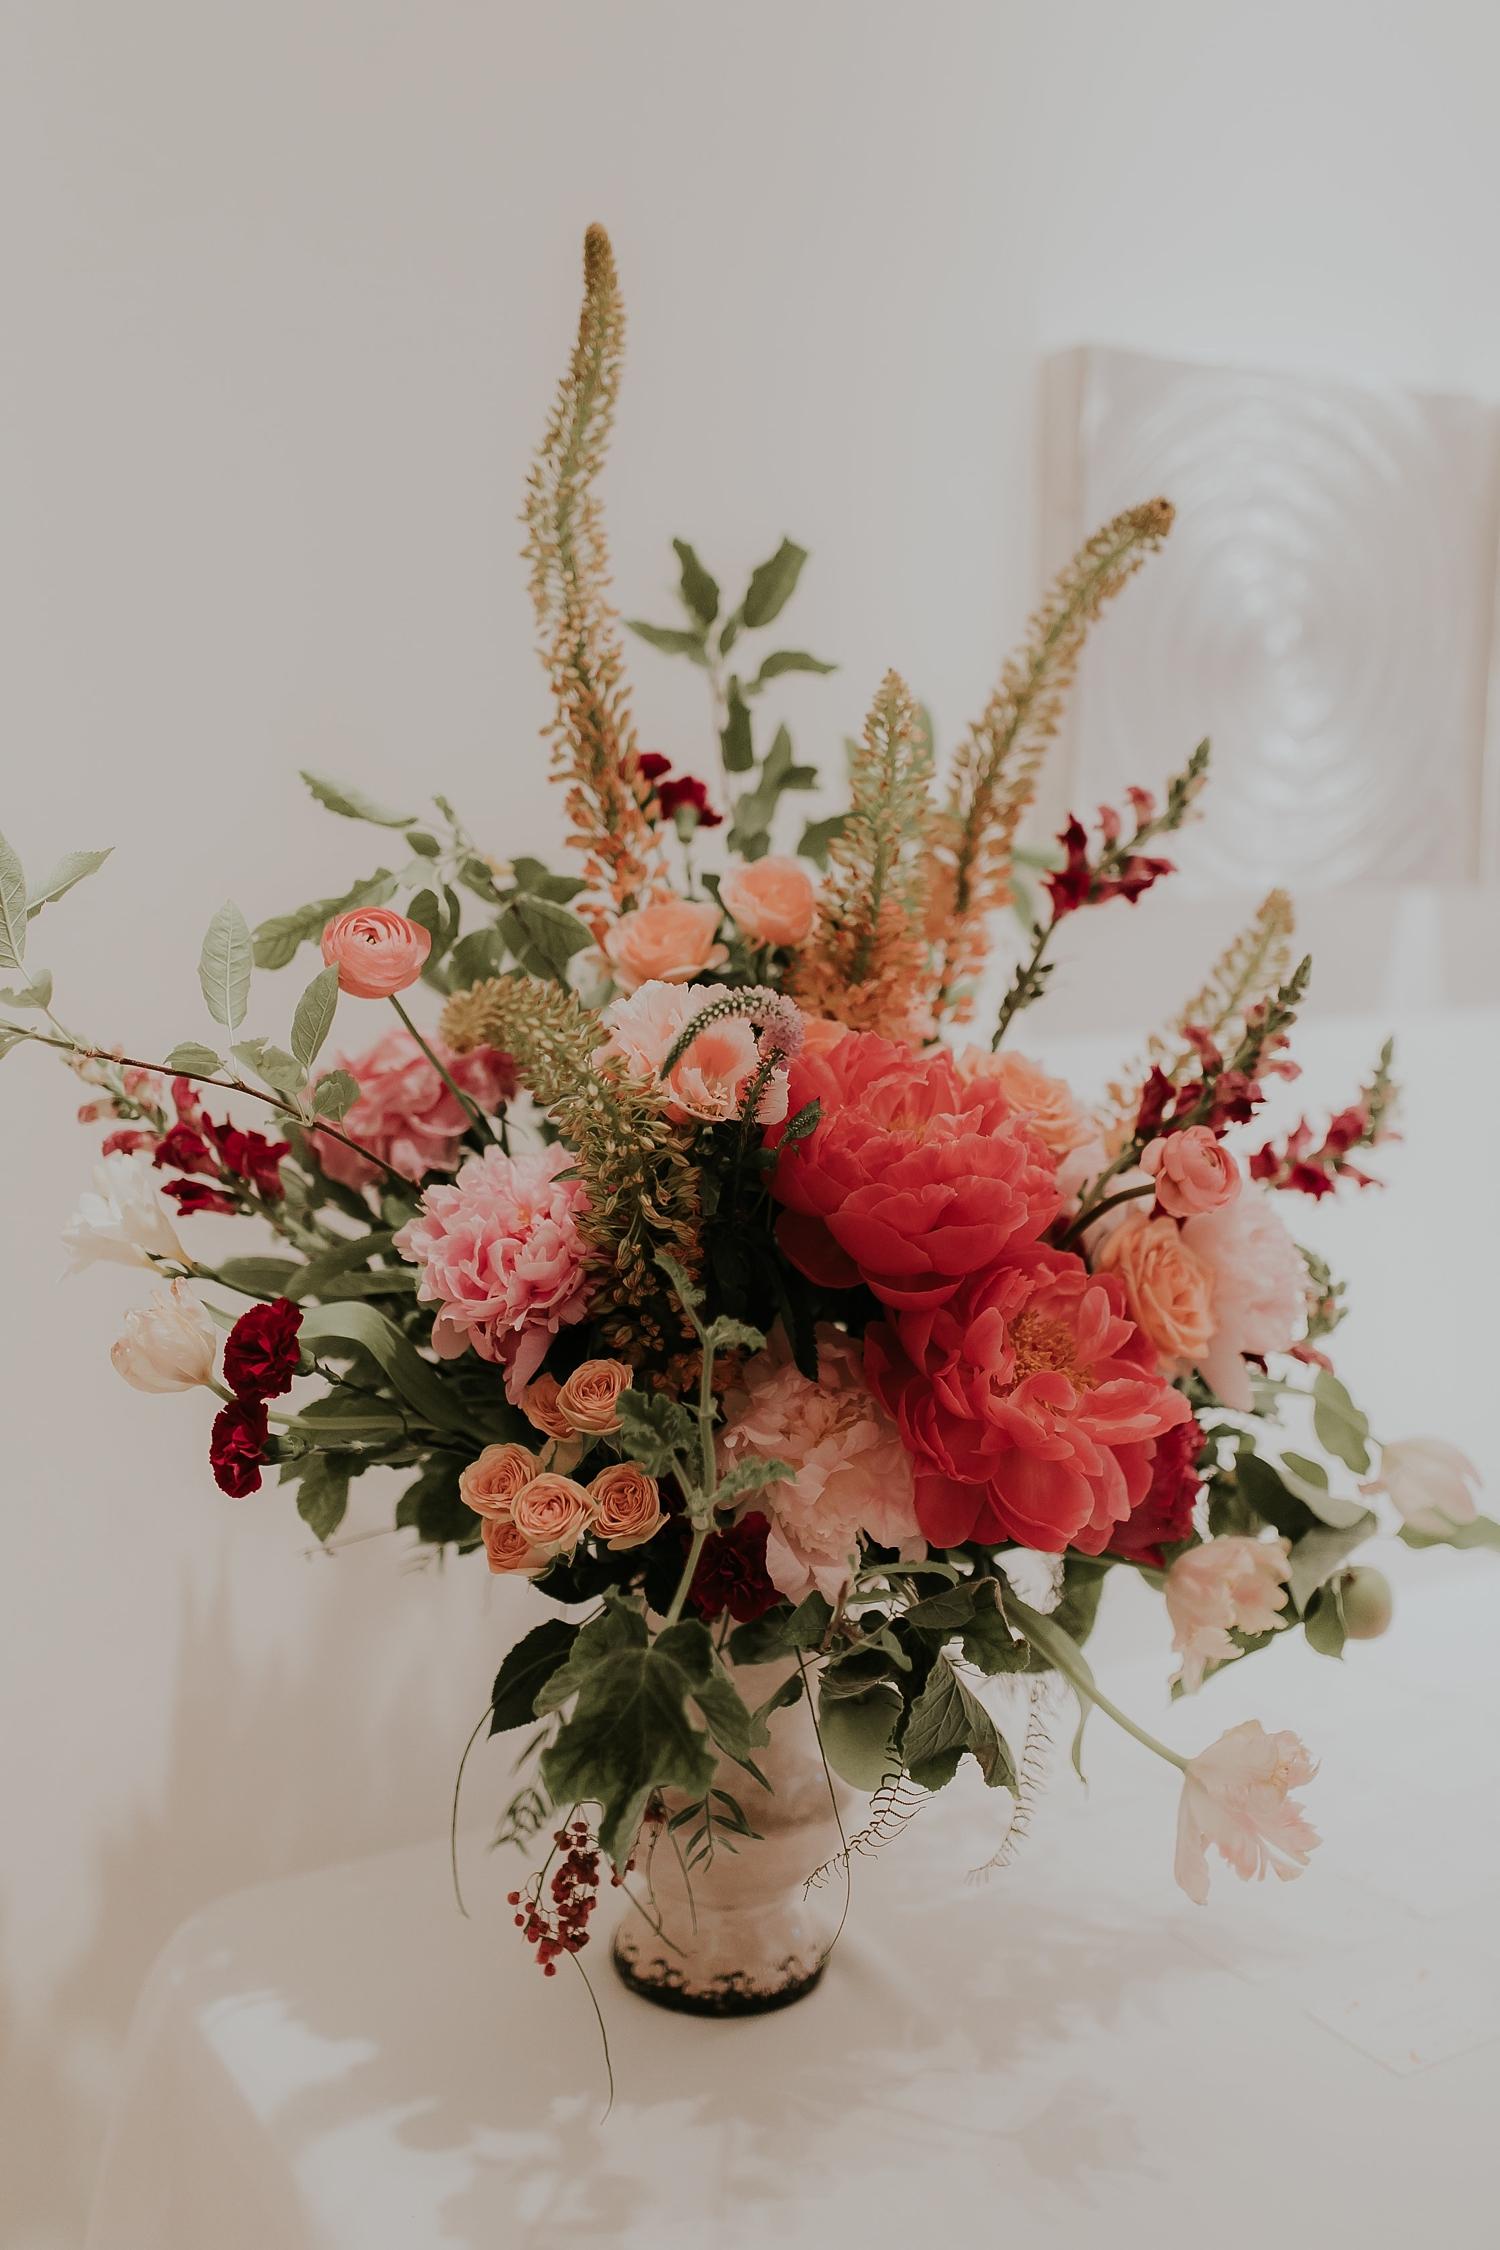 Alicia+lucia+photography+-+albuquerque+wedding+photographer+-+santa+fe+wedding+photography+-+new+mexico+wedding+photographer+-+wedding+flowers+-+summer+wedding+flowers_0011.jpg